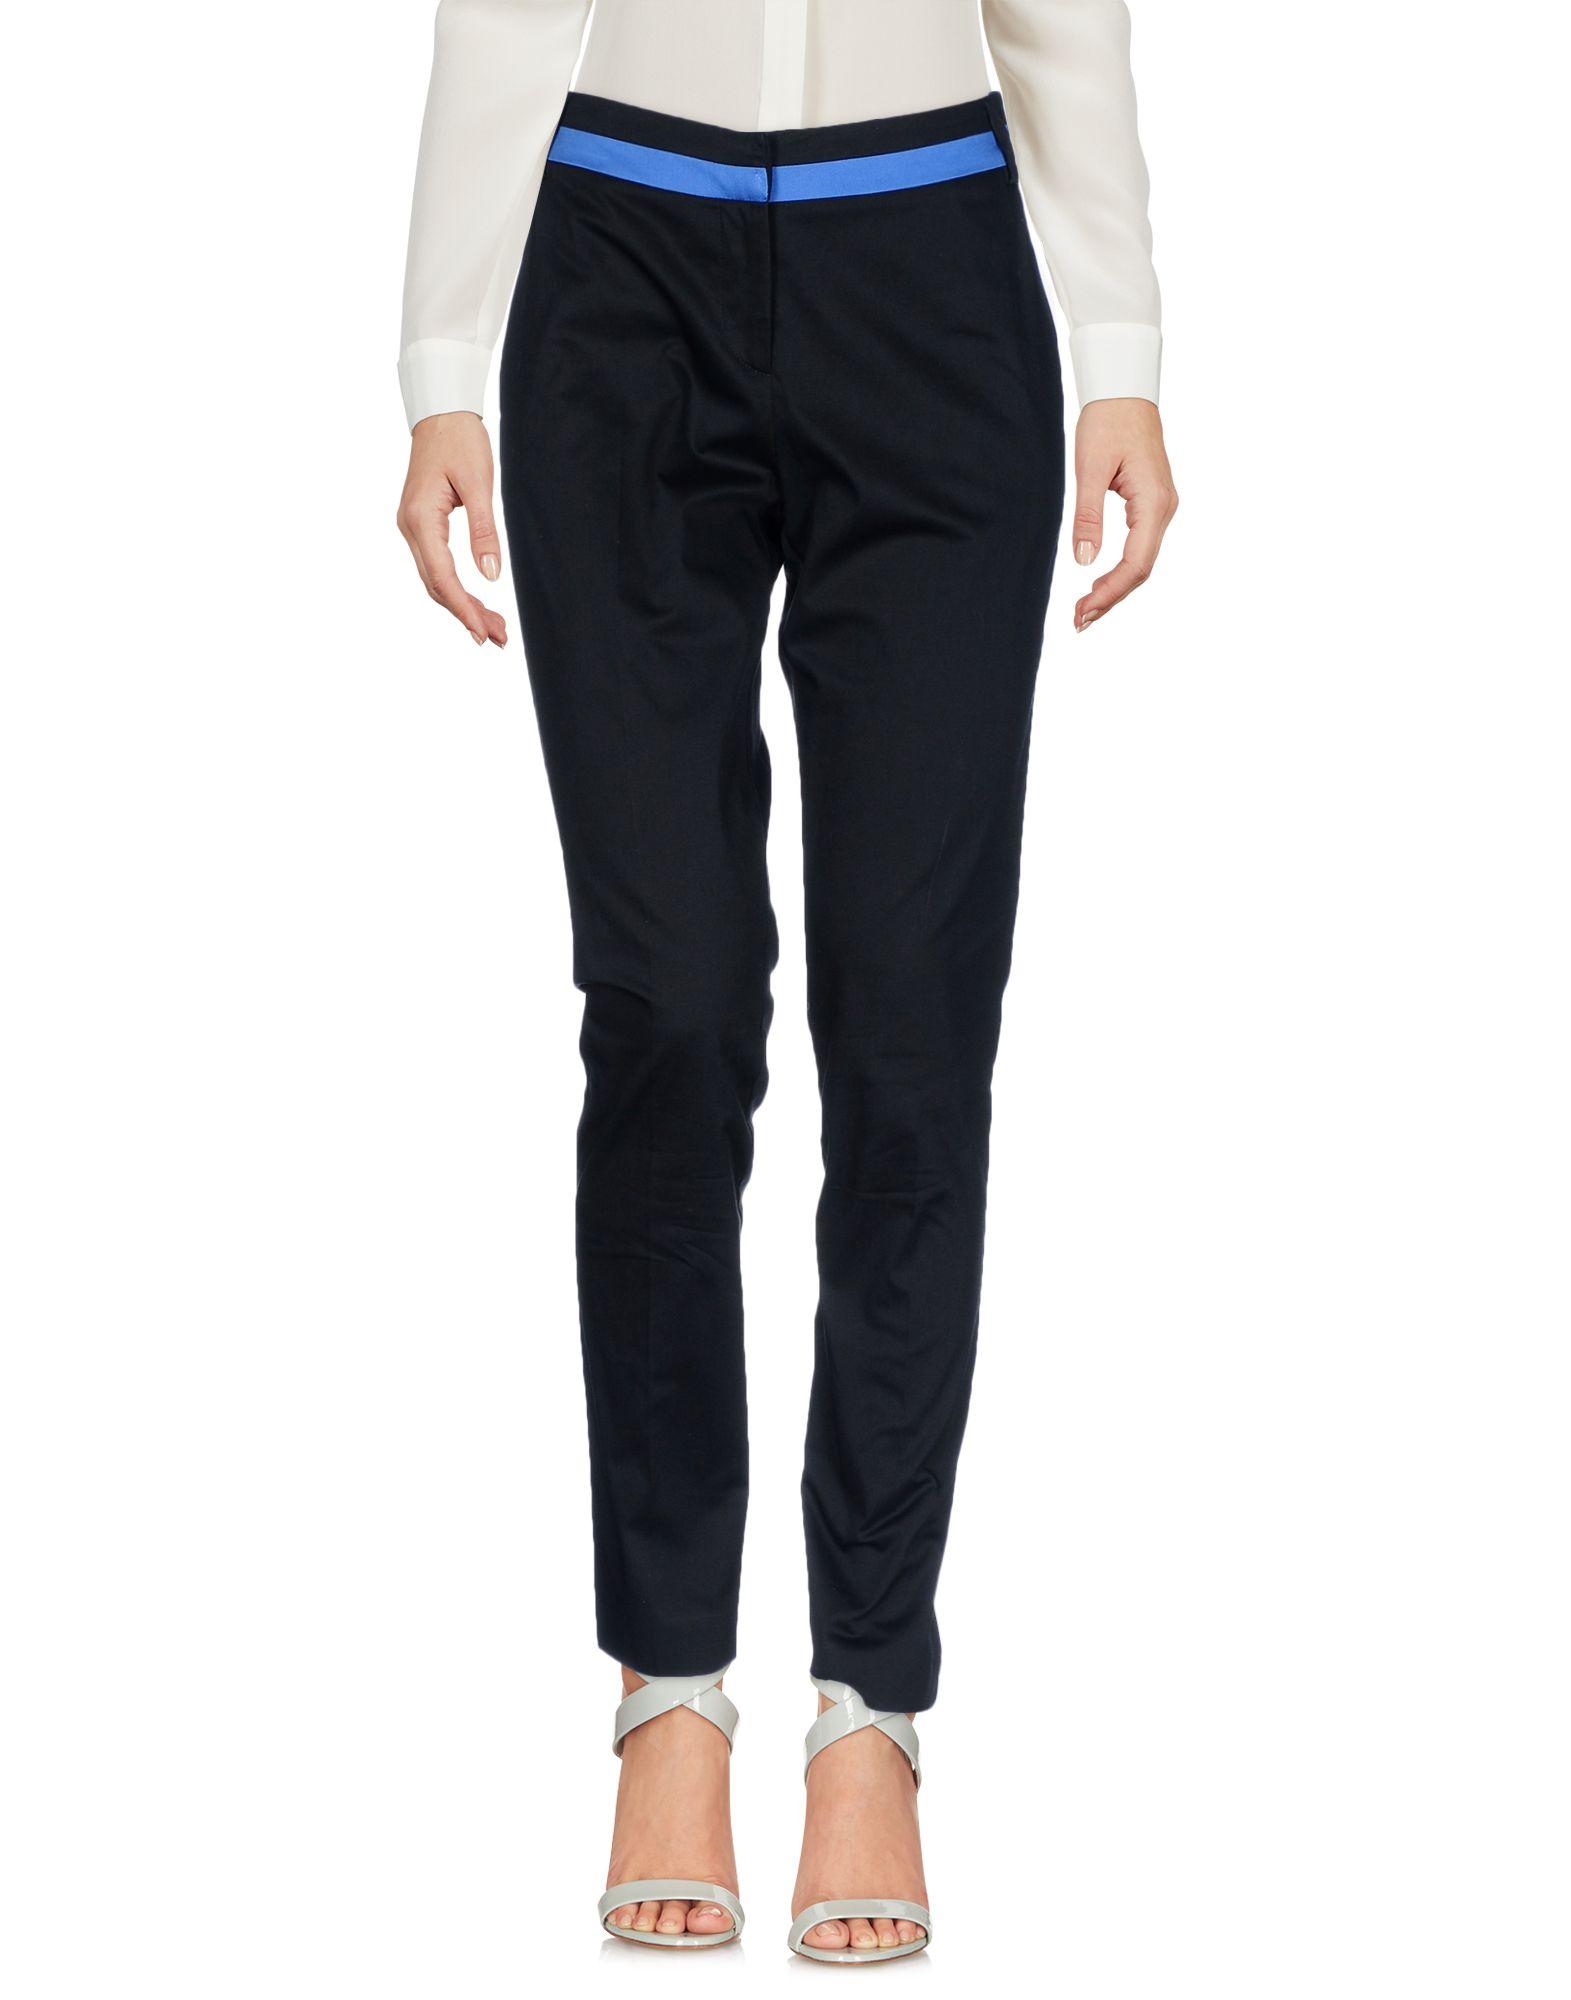 MARIELLA ROSATI Damen Hose Farbe Schwarz Größe 3